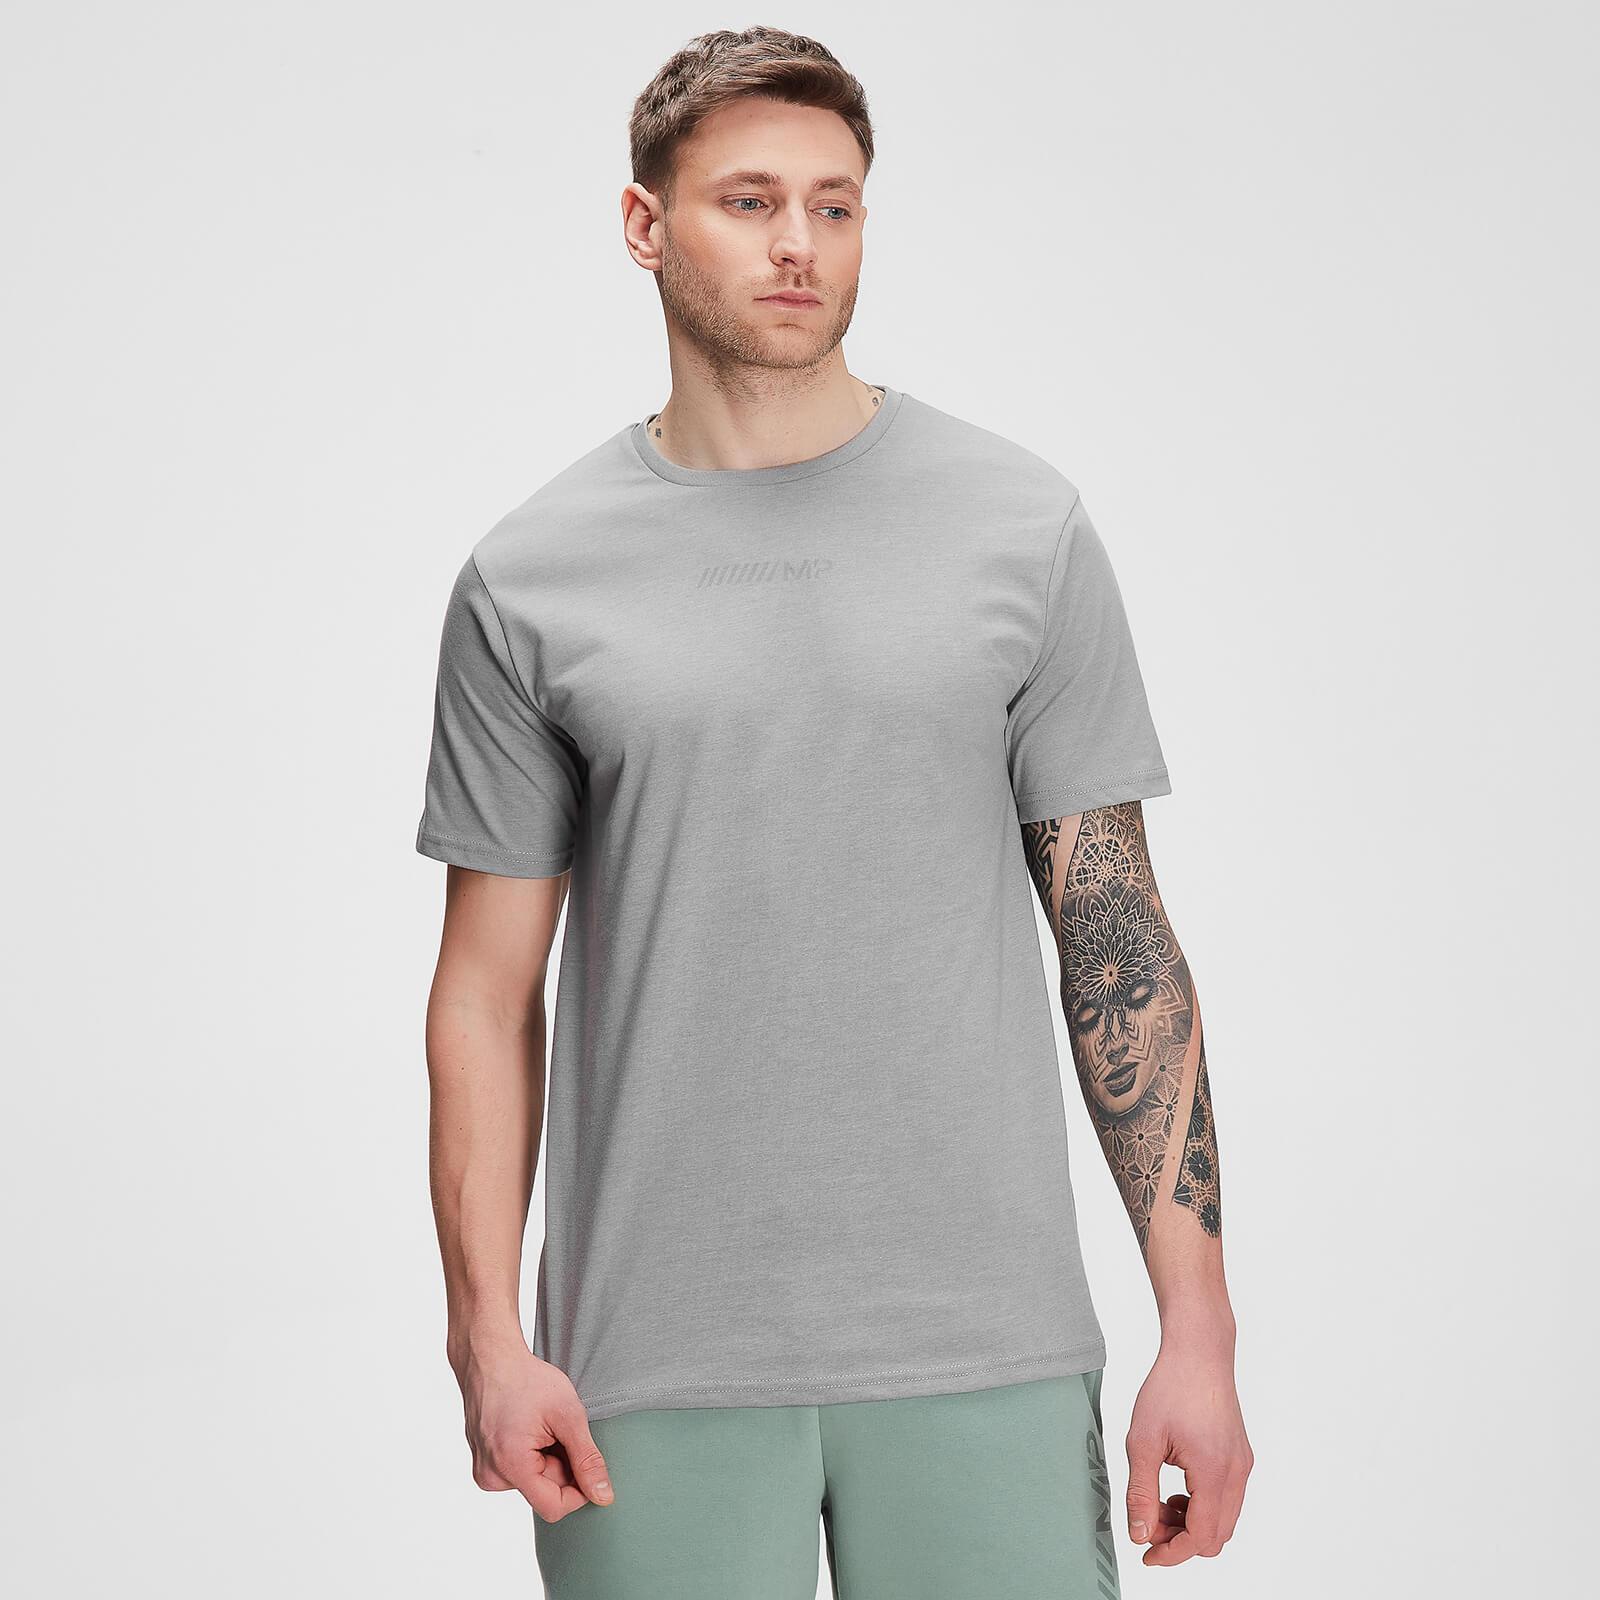 Купить Мужская футболка с короткими рукавами MP Tonal Graphic - XXXL, Myprotein International